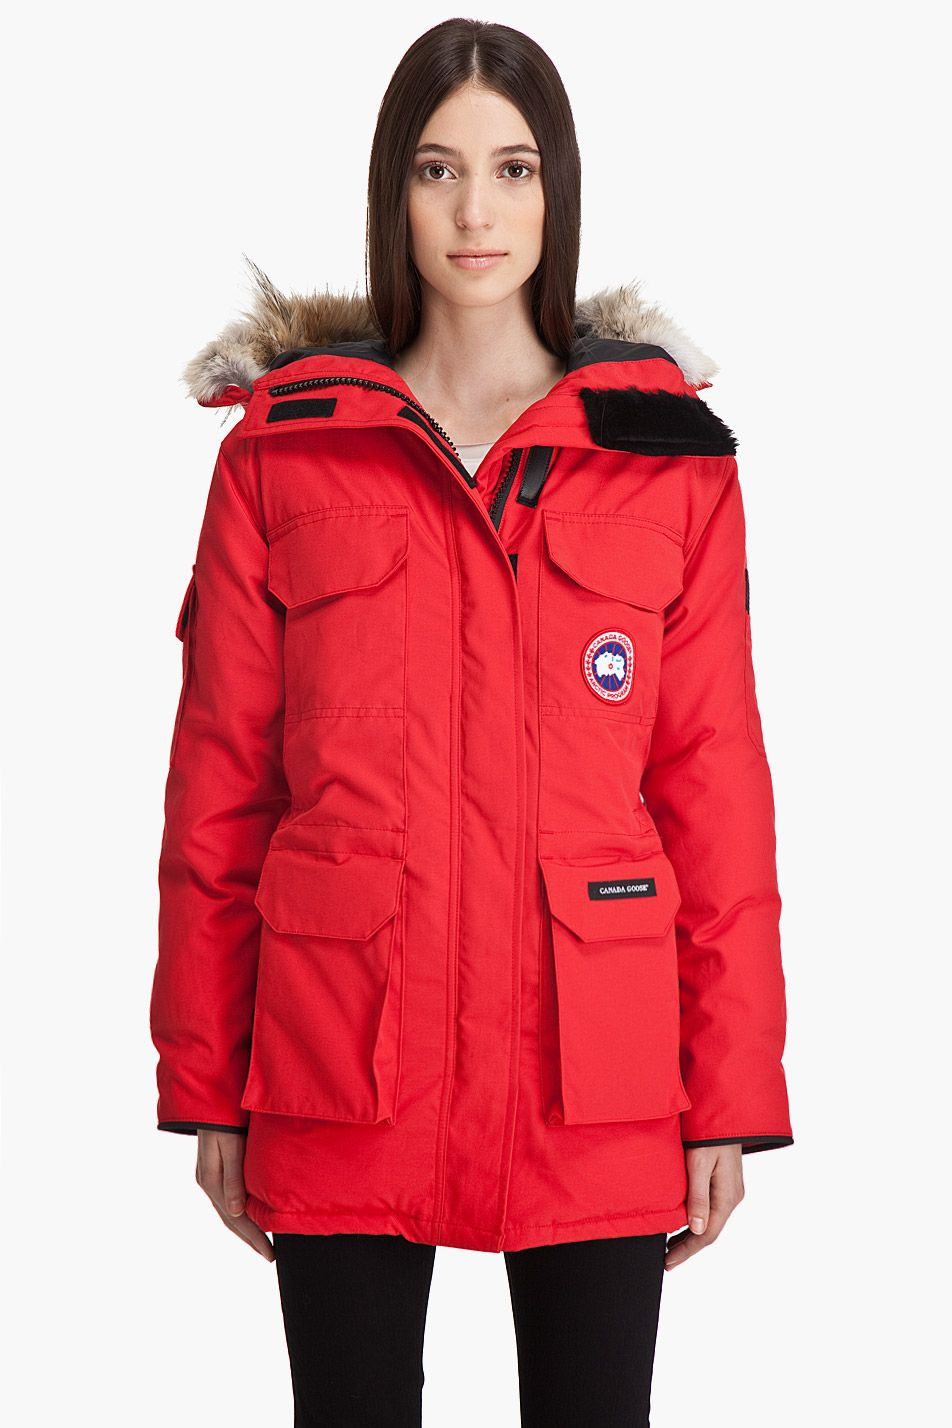 Canada Goose Women S Kensington Parka Red Canada Goose Women Kensington Parka Designer Leather Jackets